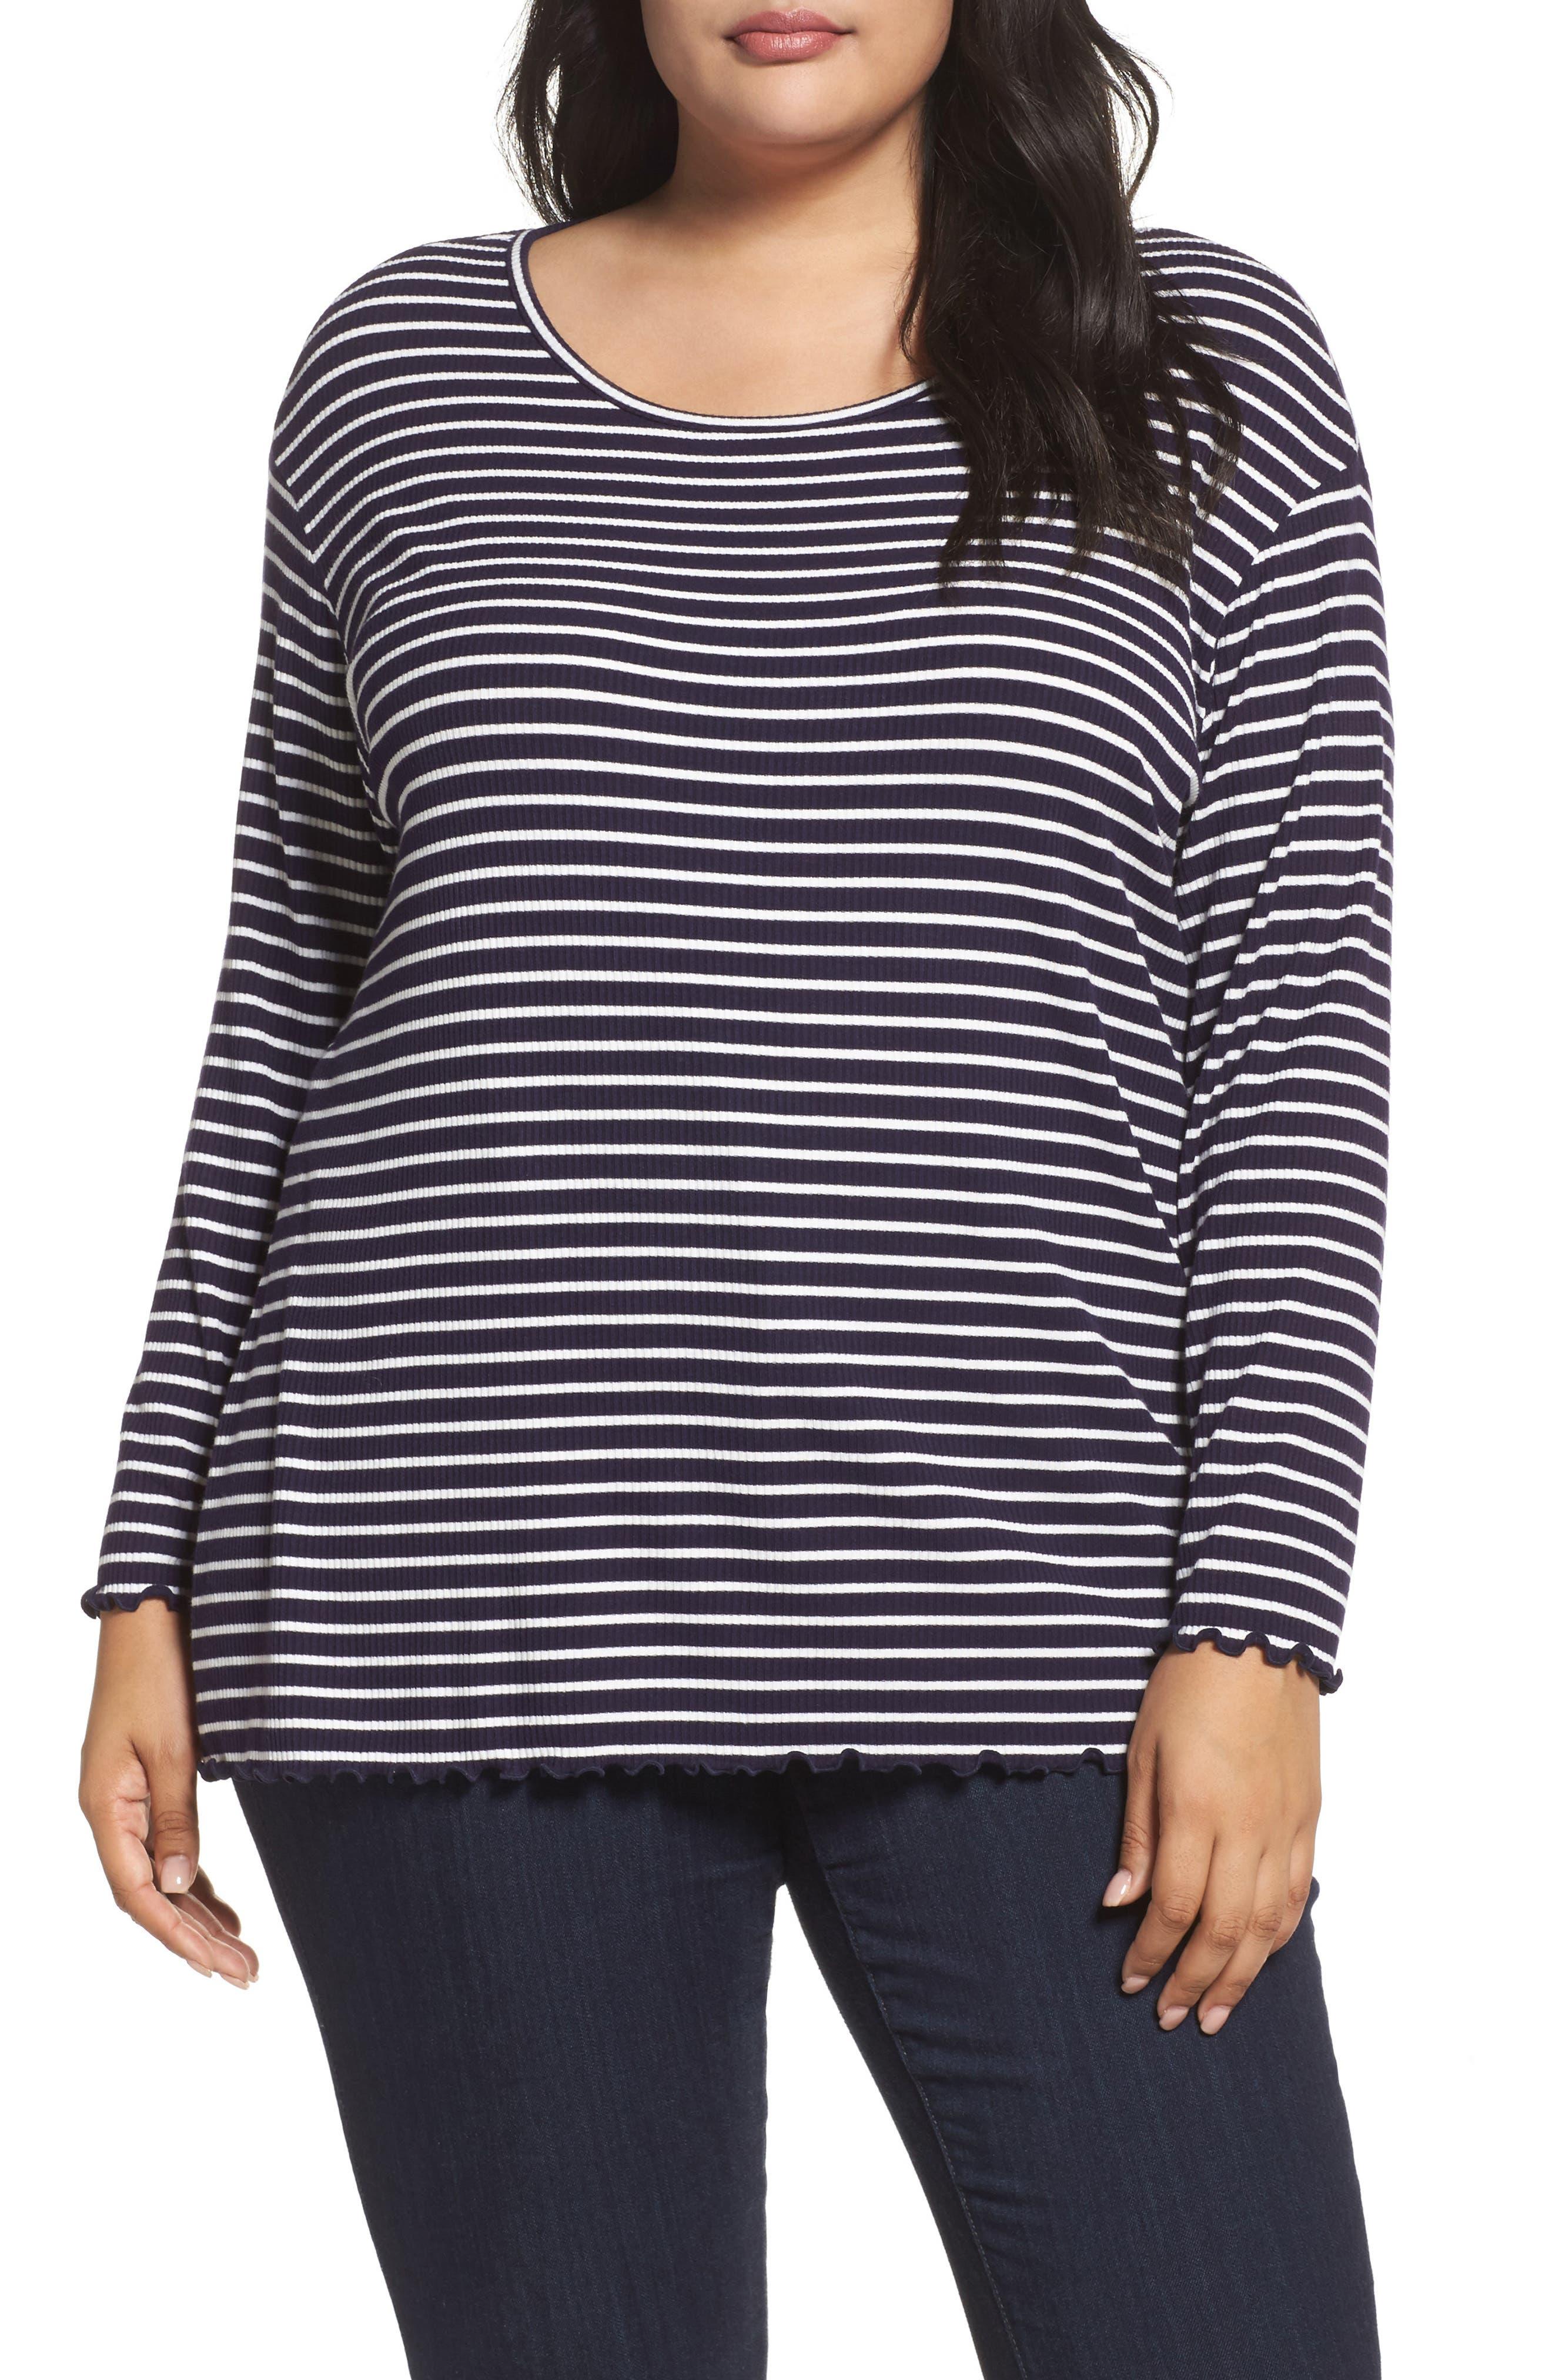 Scoop Neck Long Sleeve Tee,                         Main,                         color, Navy- White Stripe